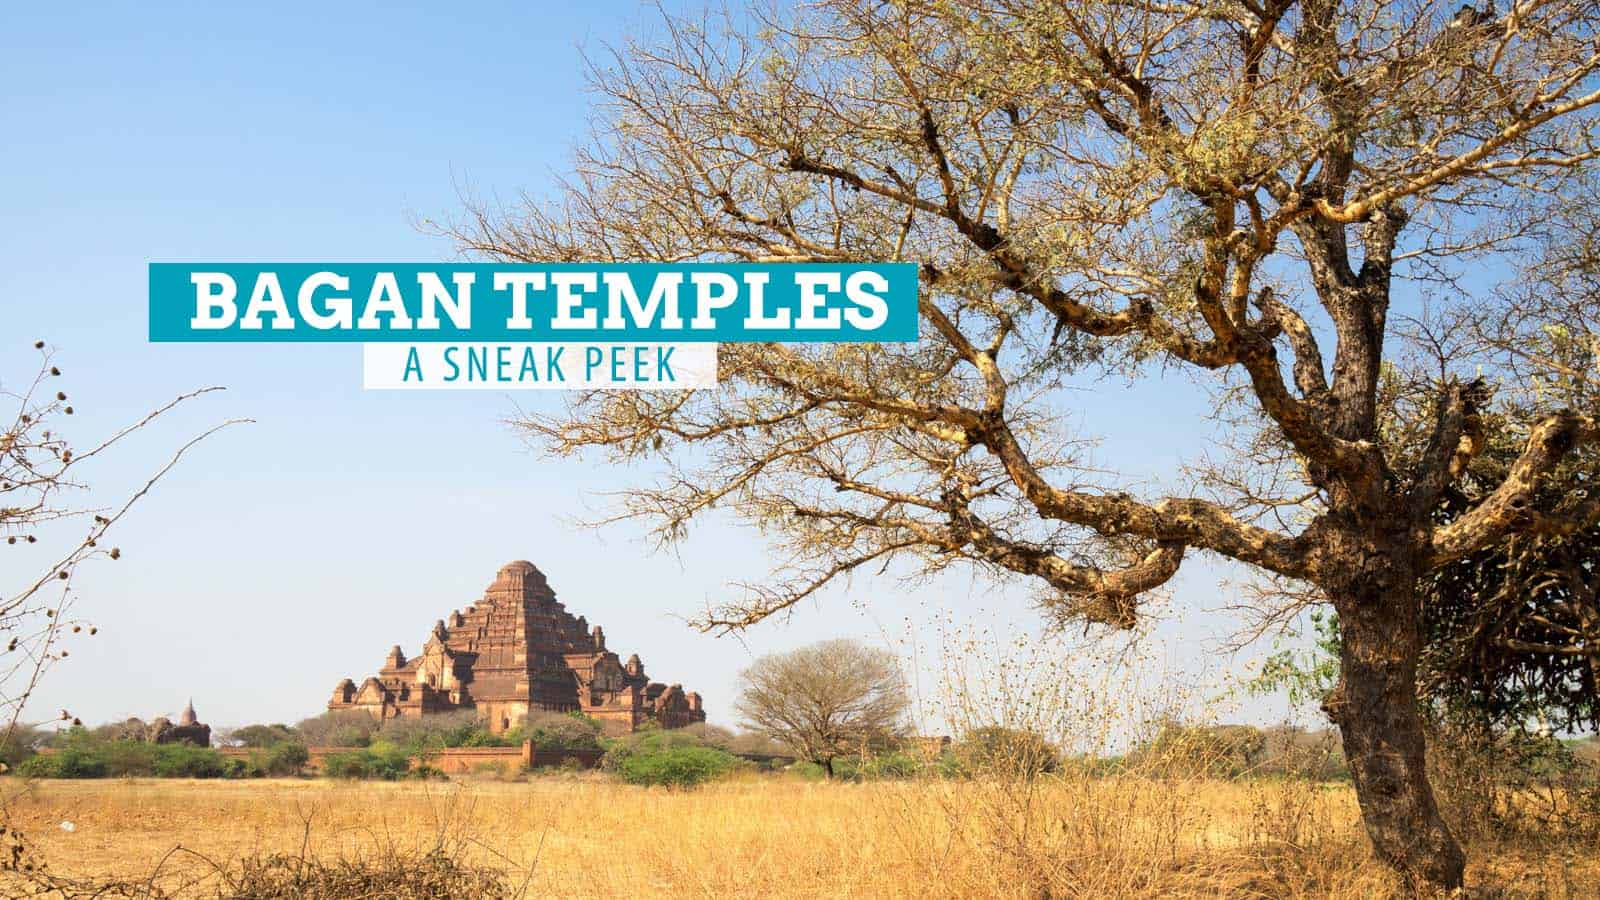 Bagan Temples: 7 Crowd Favorites (Photos)